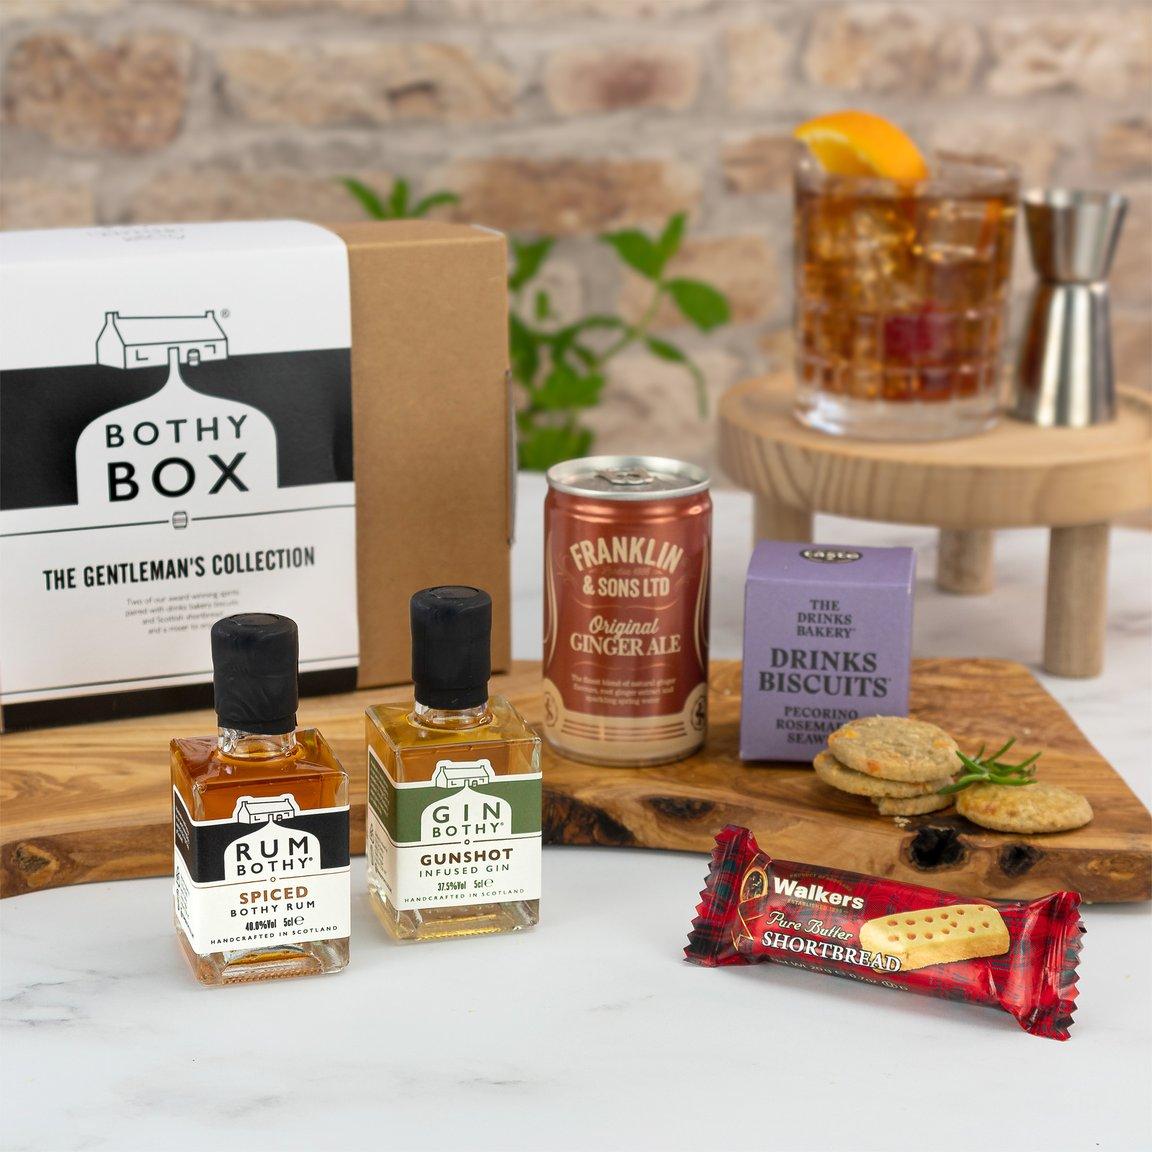 Gin Bothy - Gentleman's Collection Gift Box